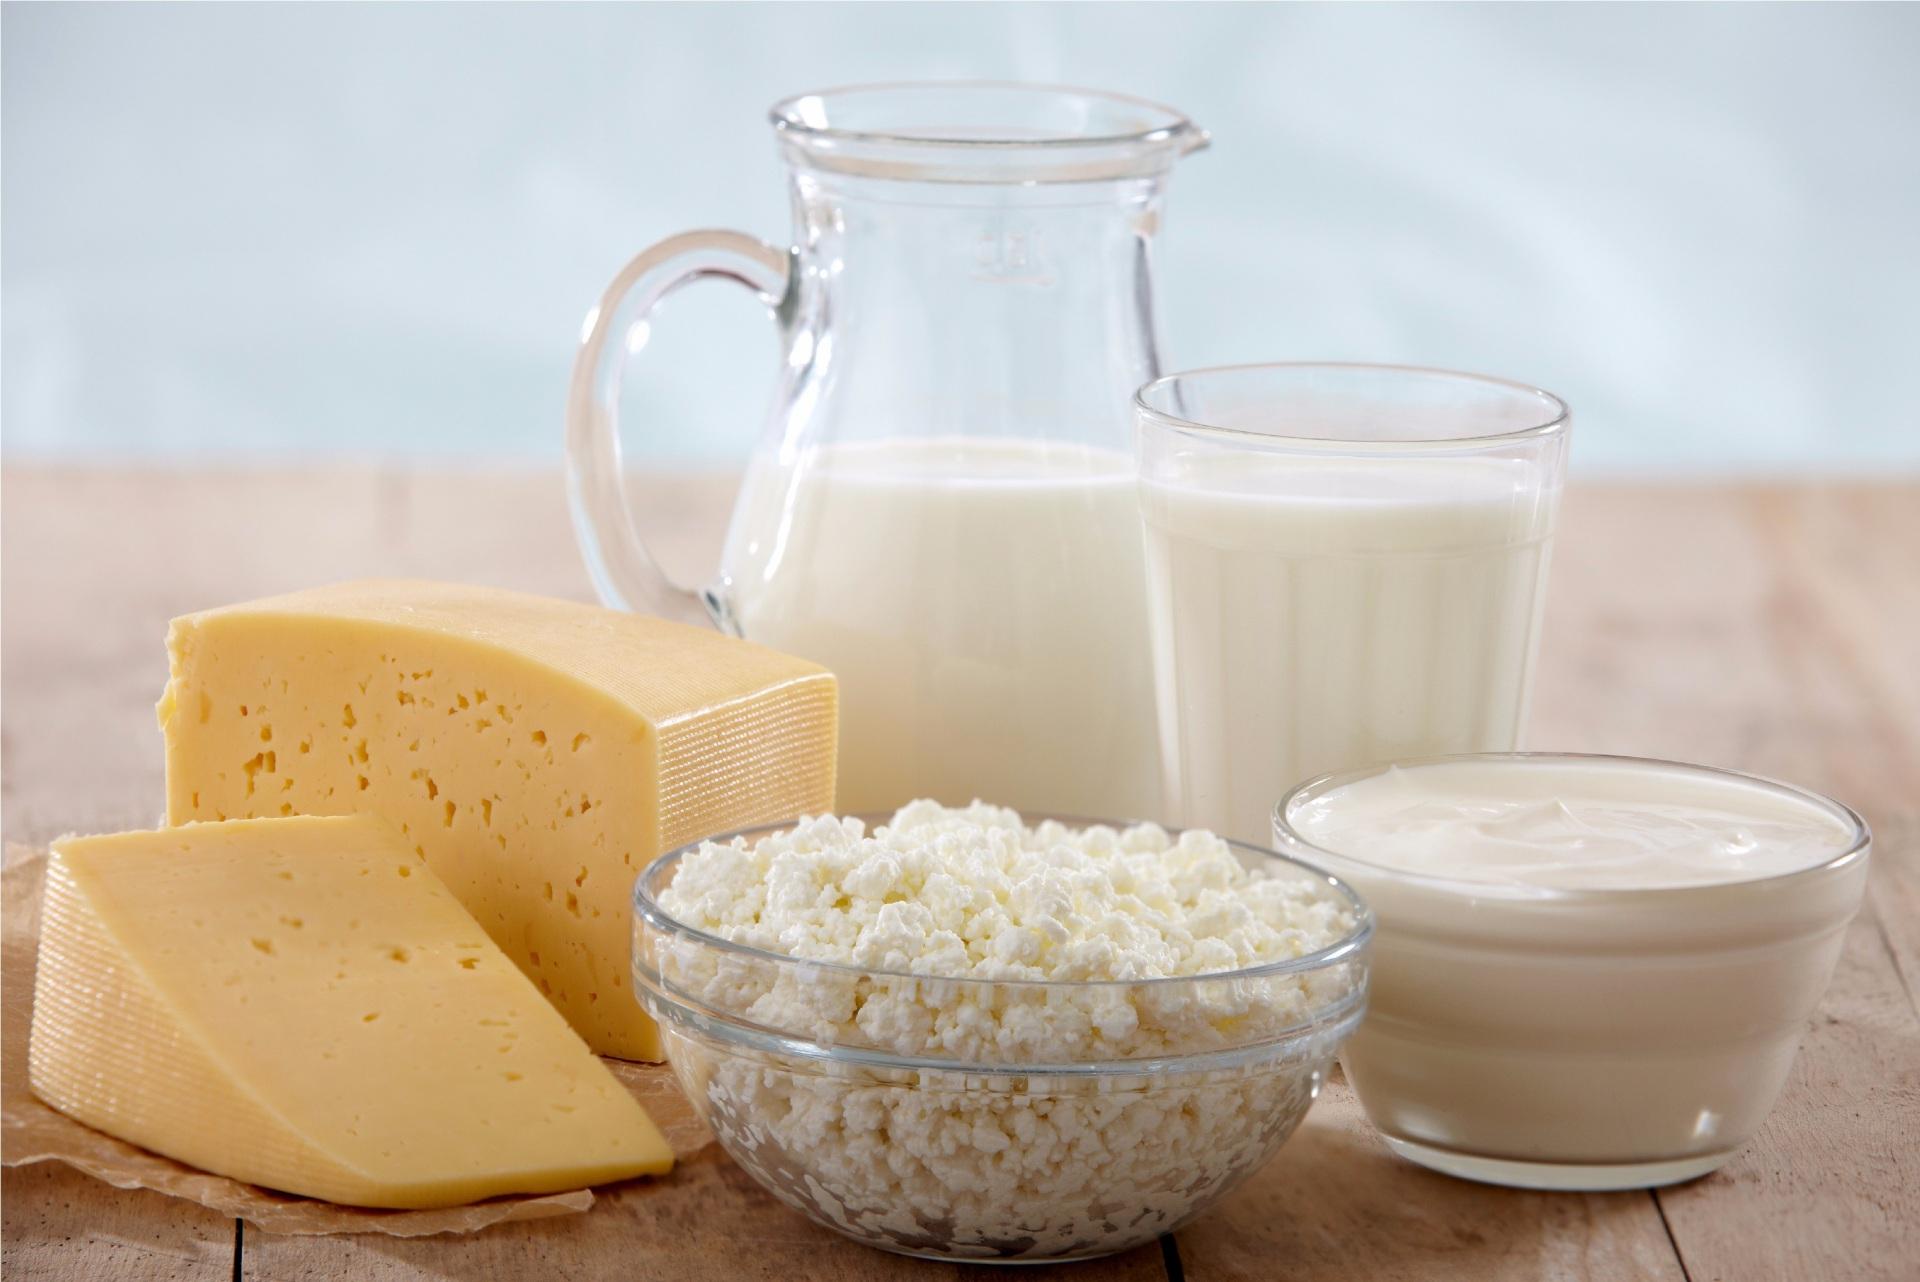 Роспотребнадзор Коми изъял 83 килограмма молочного фальсификата